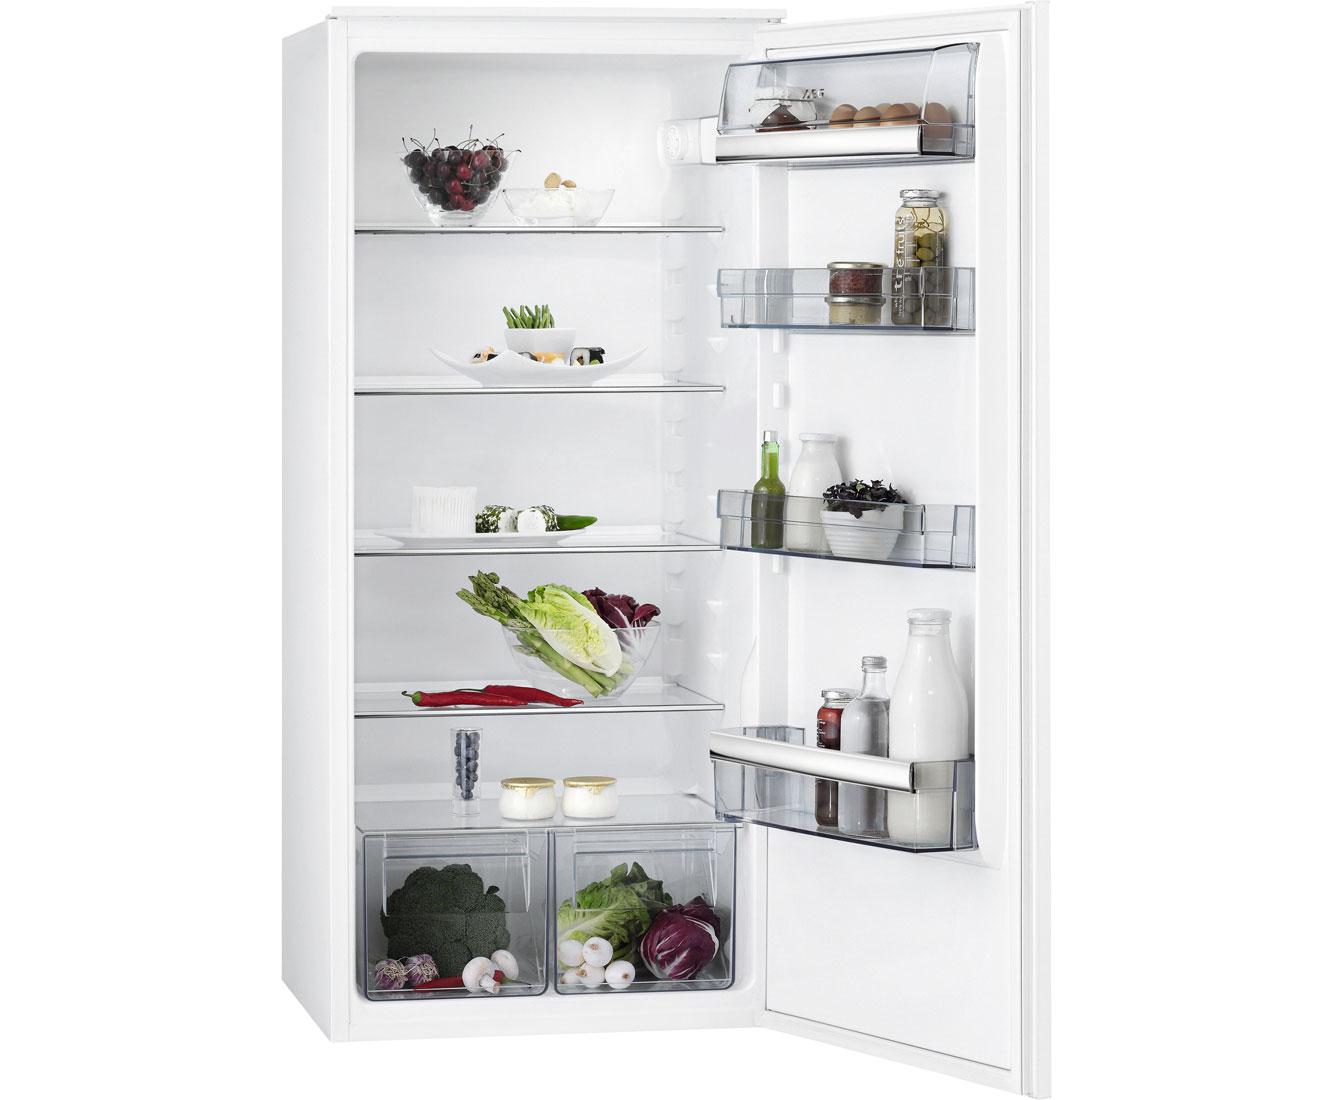 Aeg Kühlschrank Idealo : Aeg skb as einbau kühlschrank er nische schlepptür